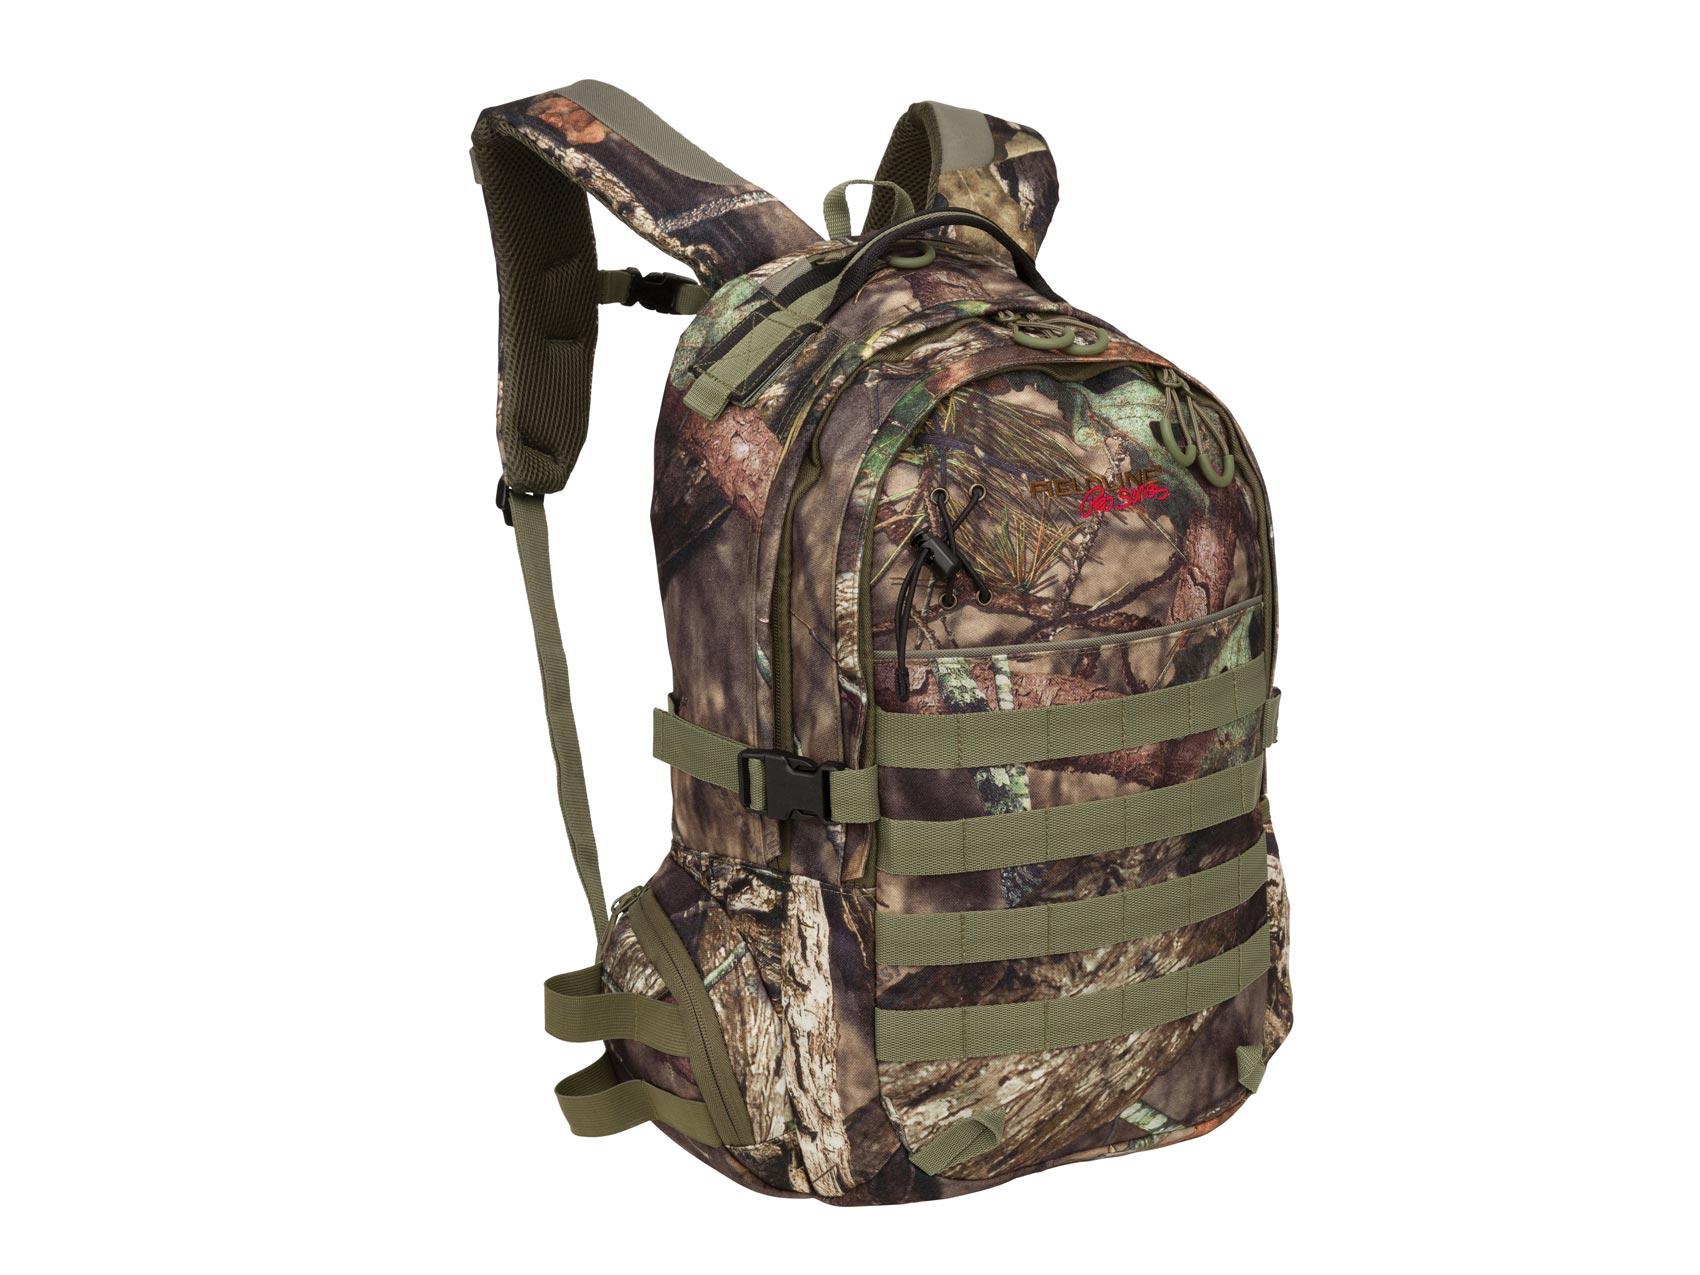 Fieldline camouflage backpack